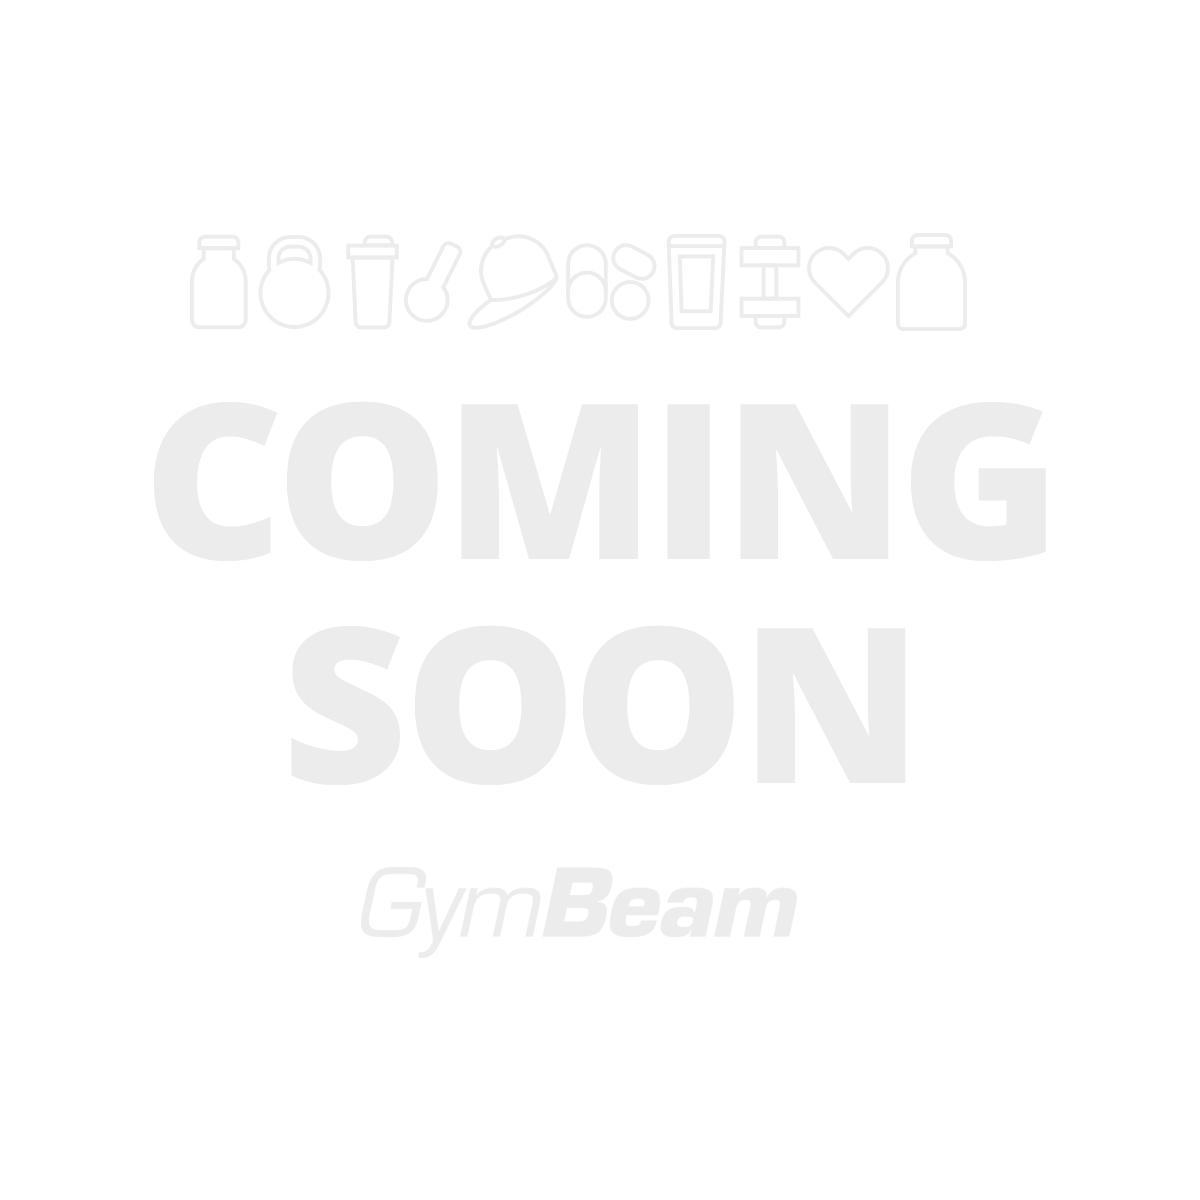 Proteinová tyčinka Low Carb High Protein 50 g - Weider